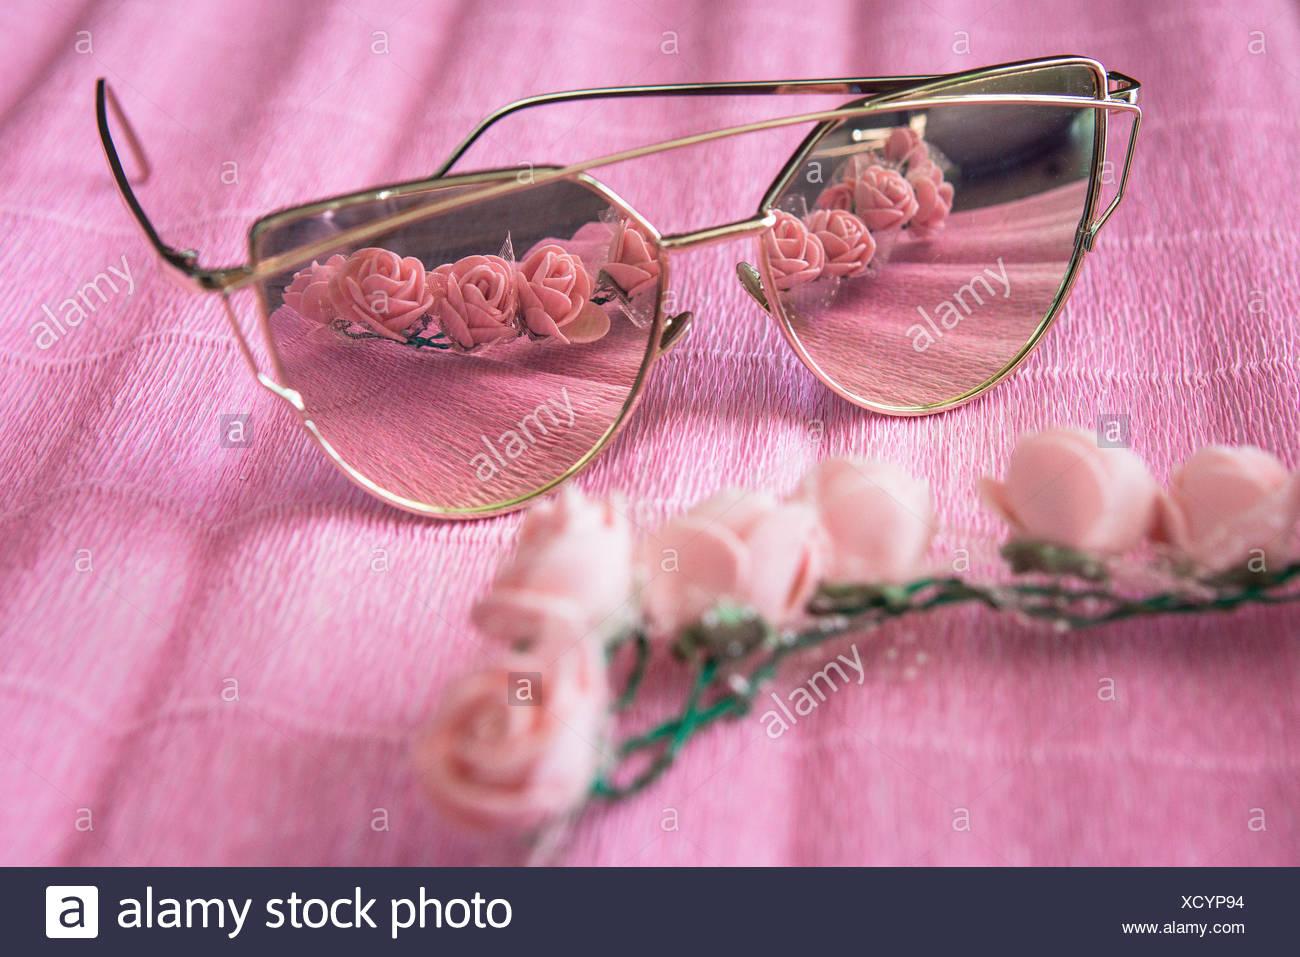 accessory - Stock Image